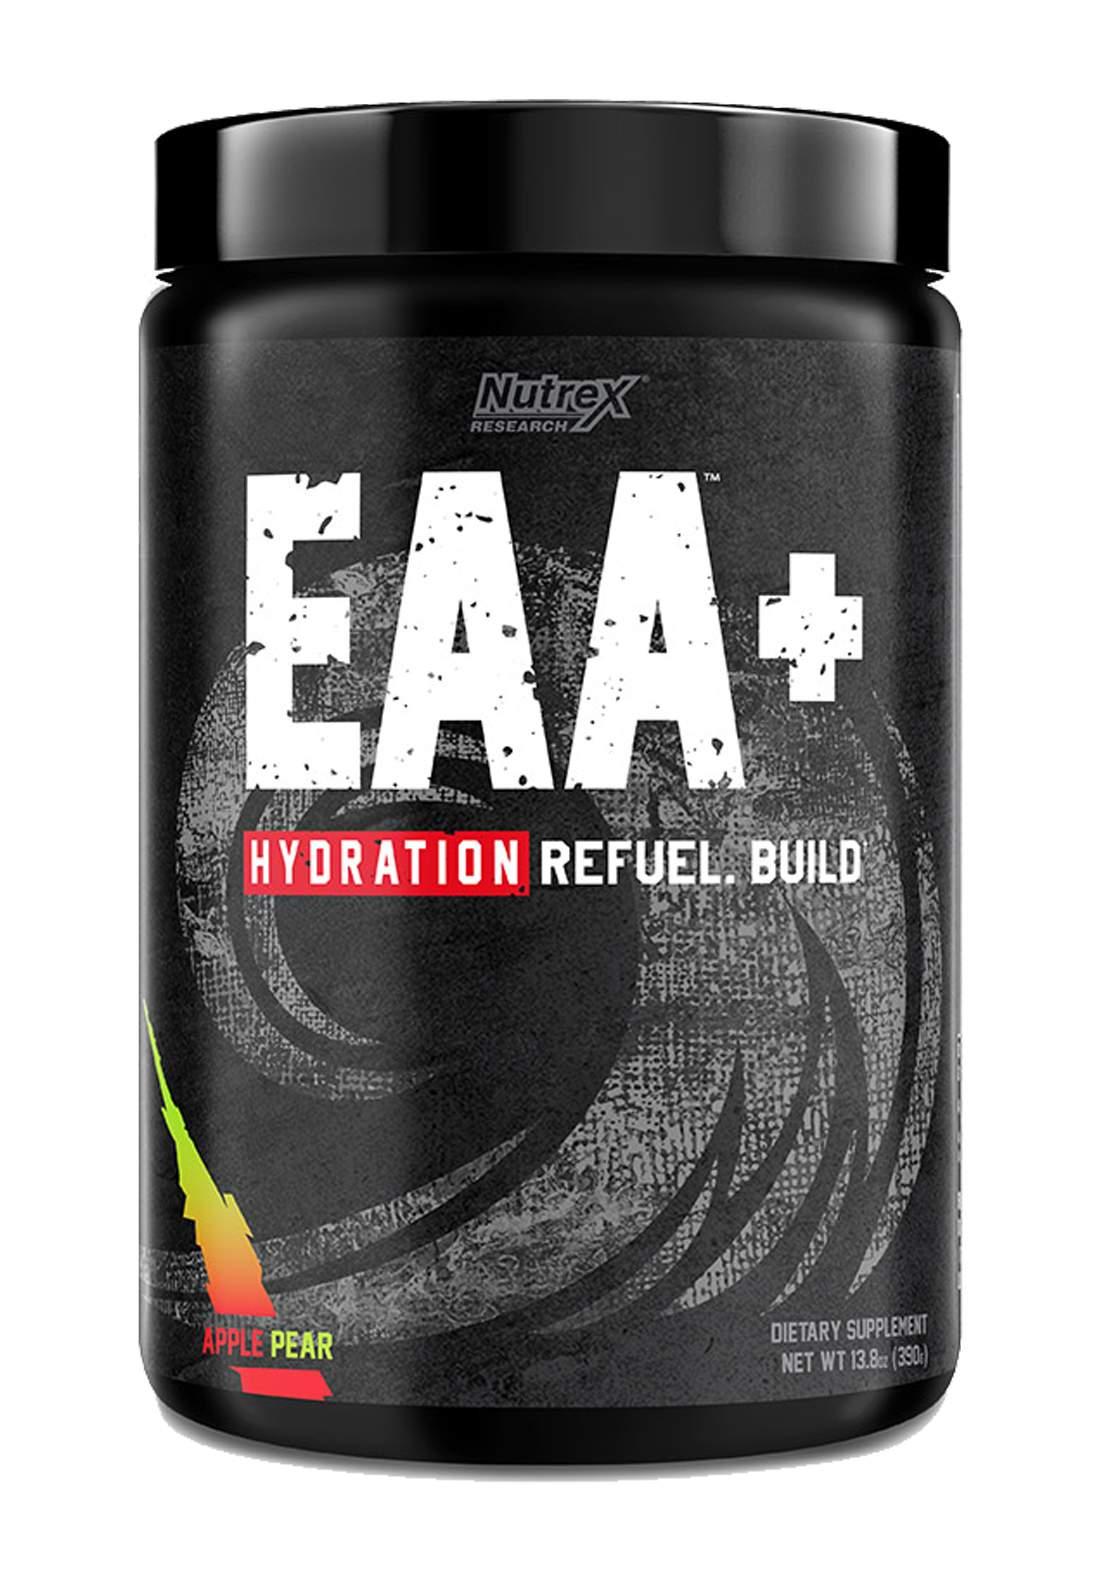 Nutrex Research EAA Hydration Refulel Build Apple Pear  30 Serve مكمل احماض امينية